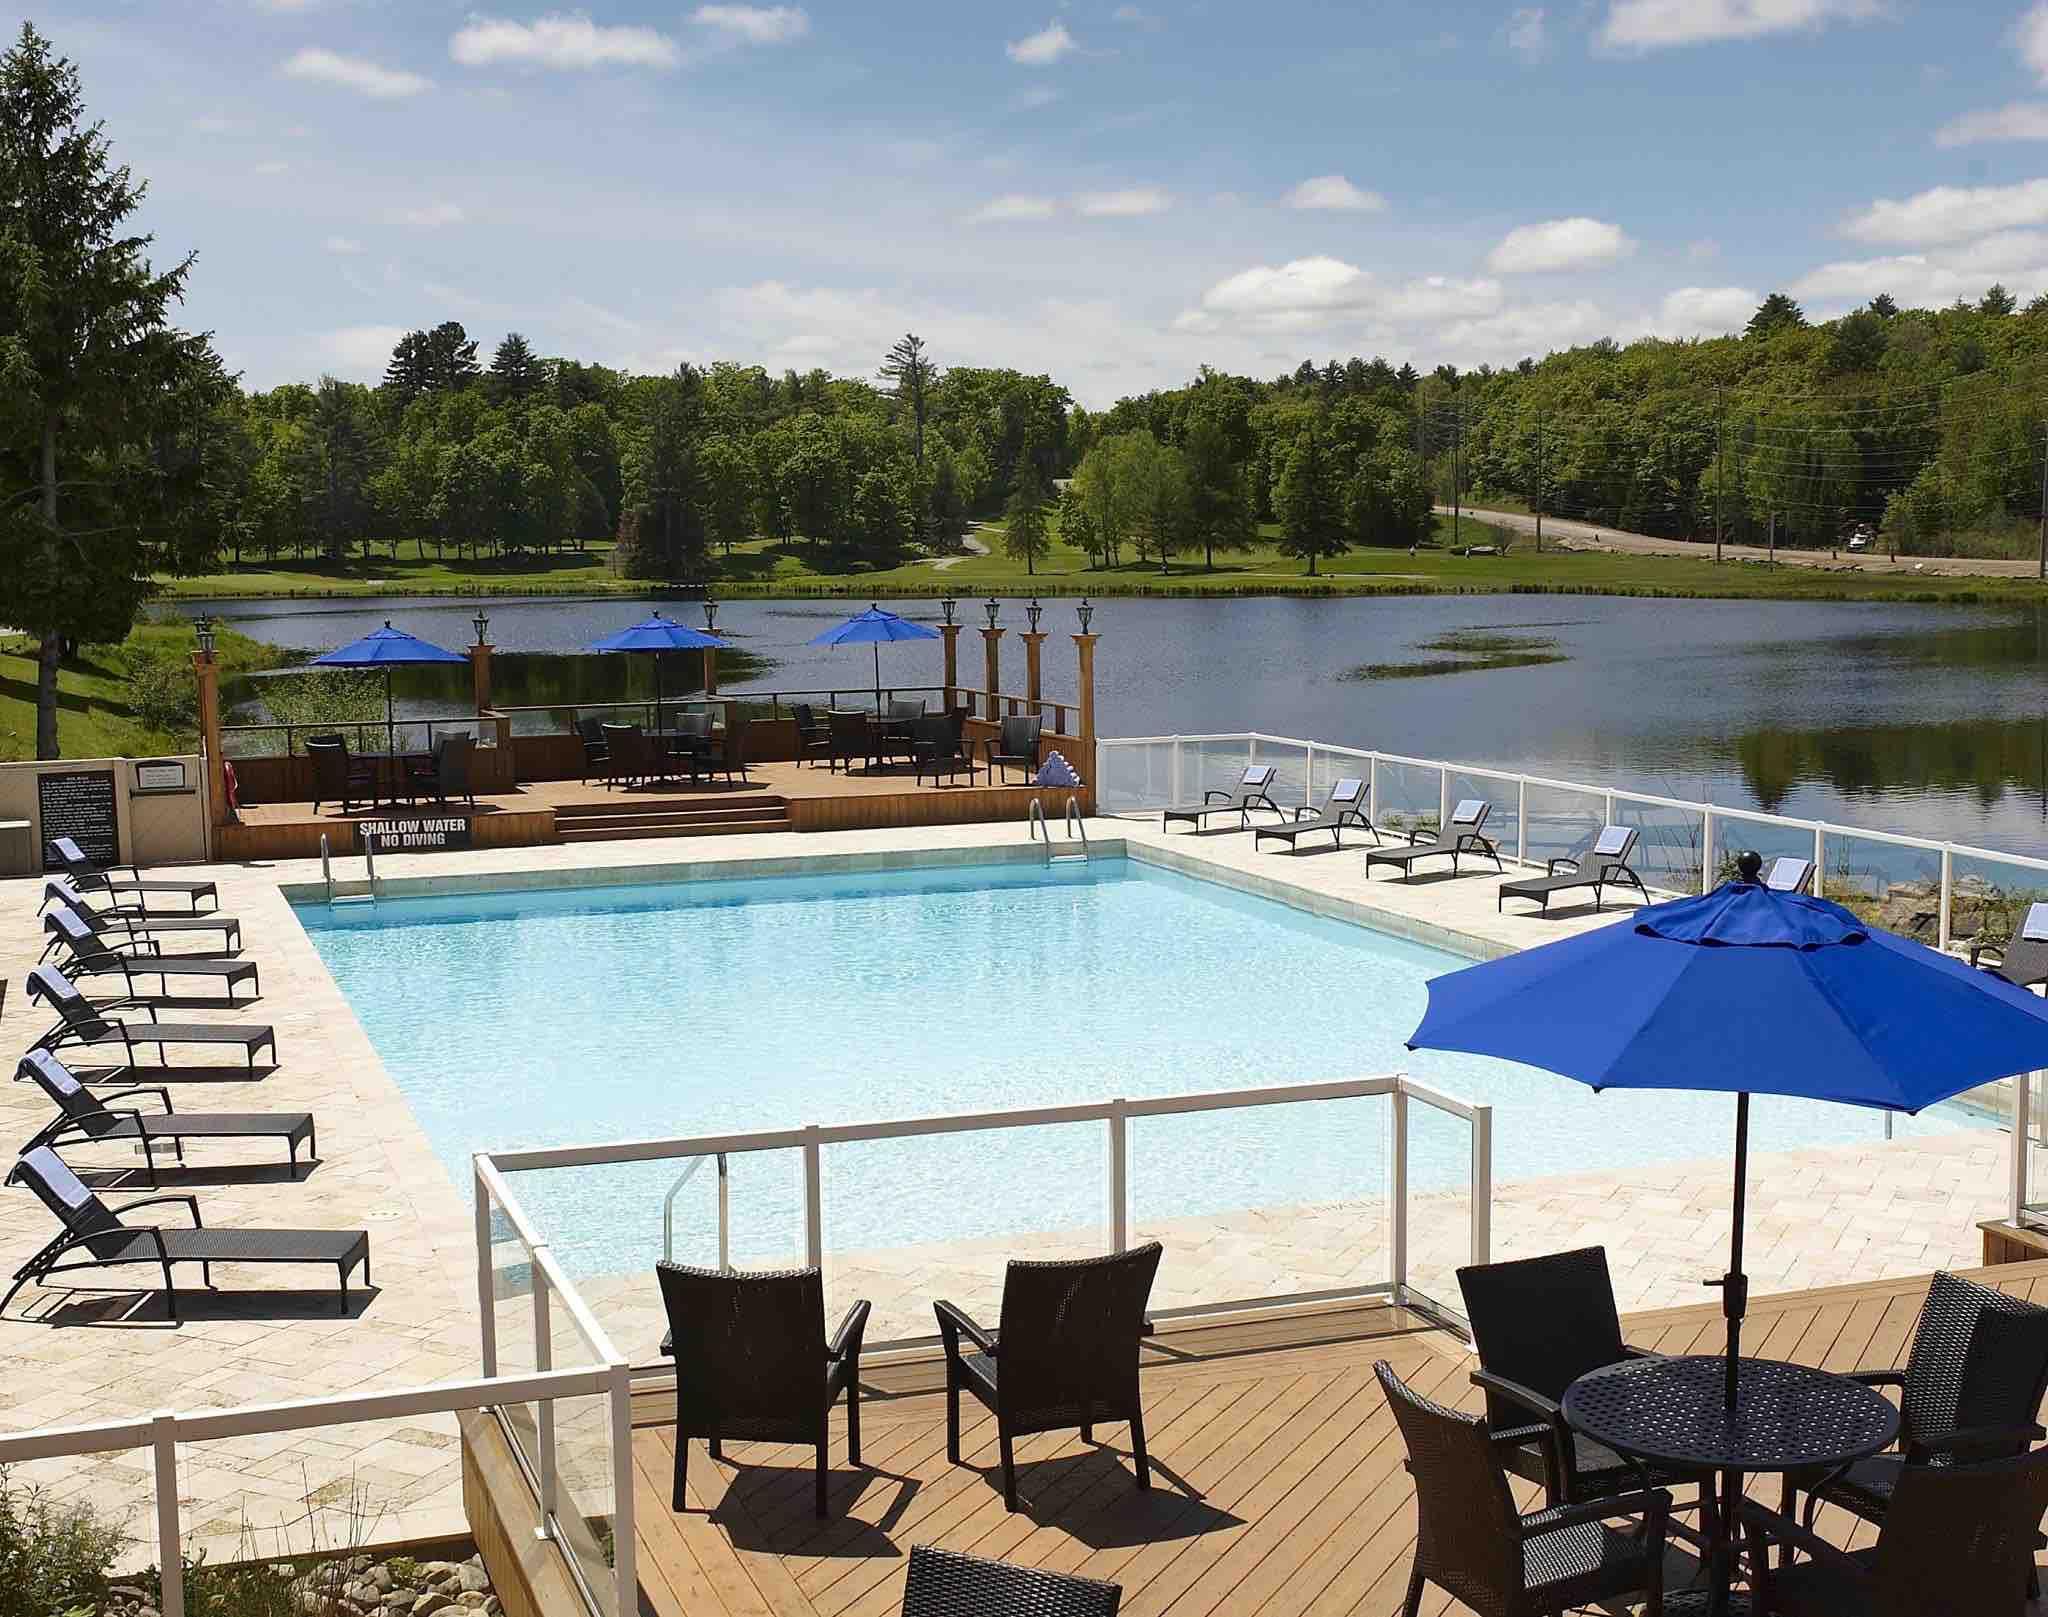 Pinestone Resort Haliburton Hotels swimming pool in summeer